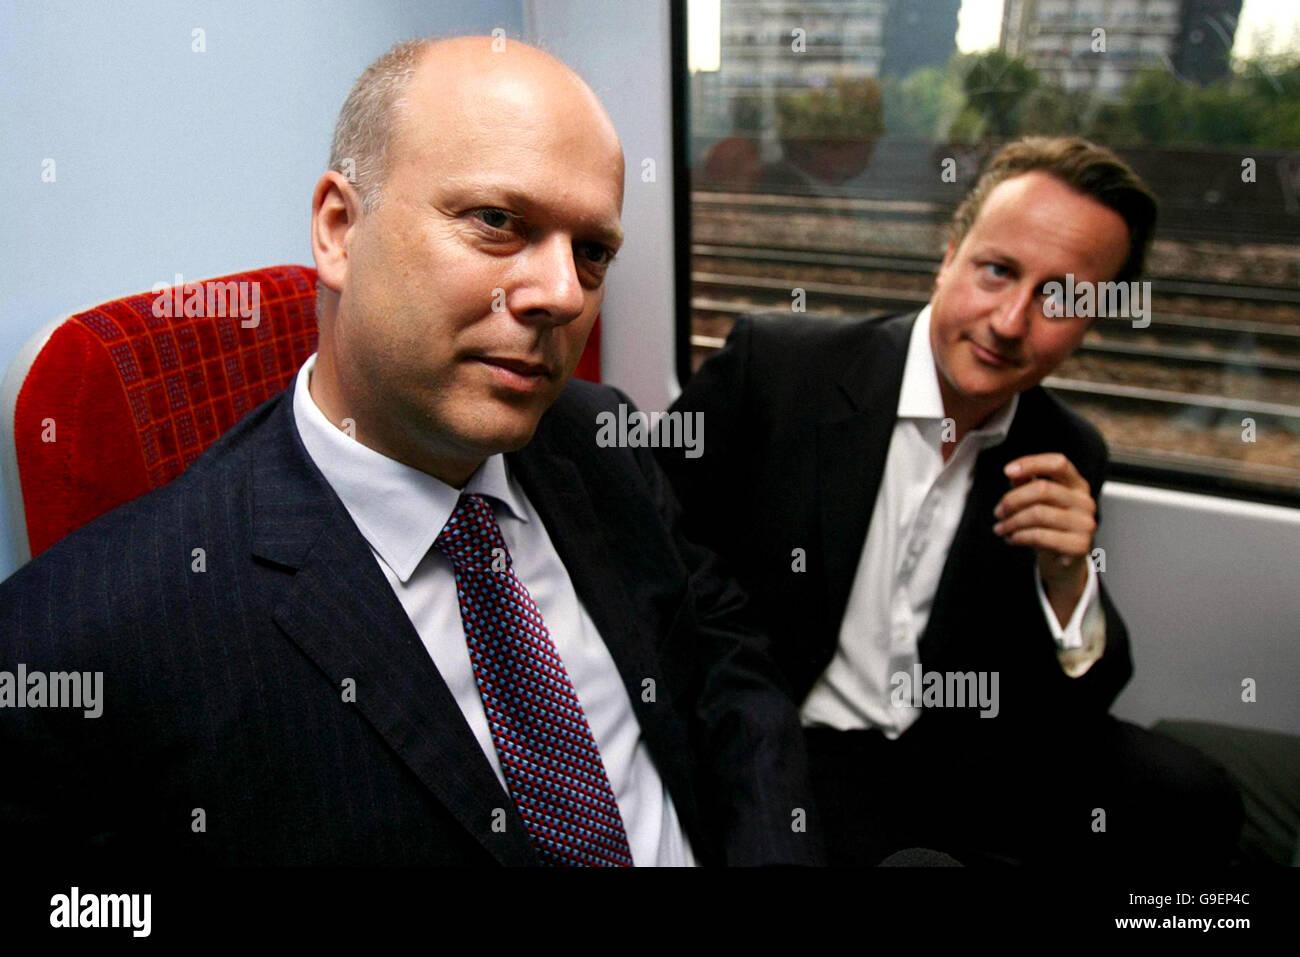 David Cameron at Clapham Junction railway station - Stock Image